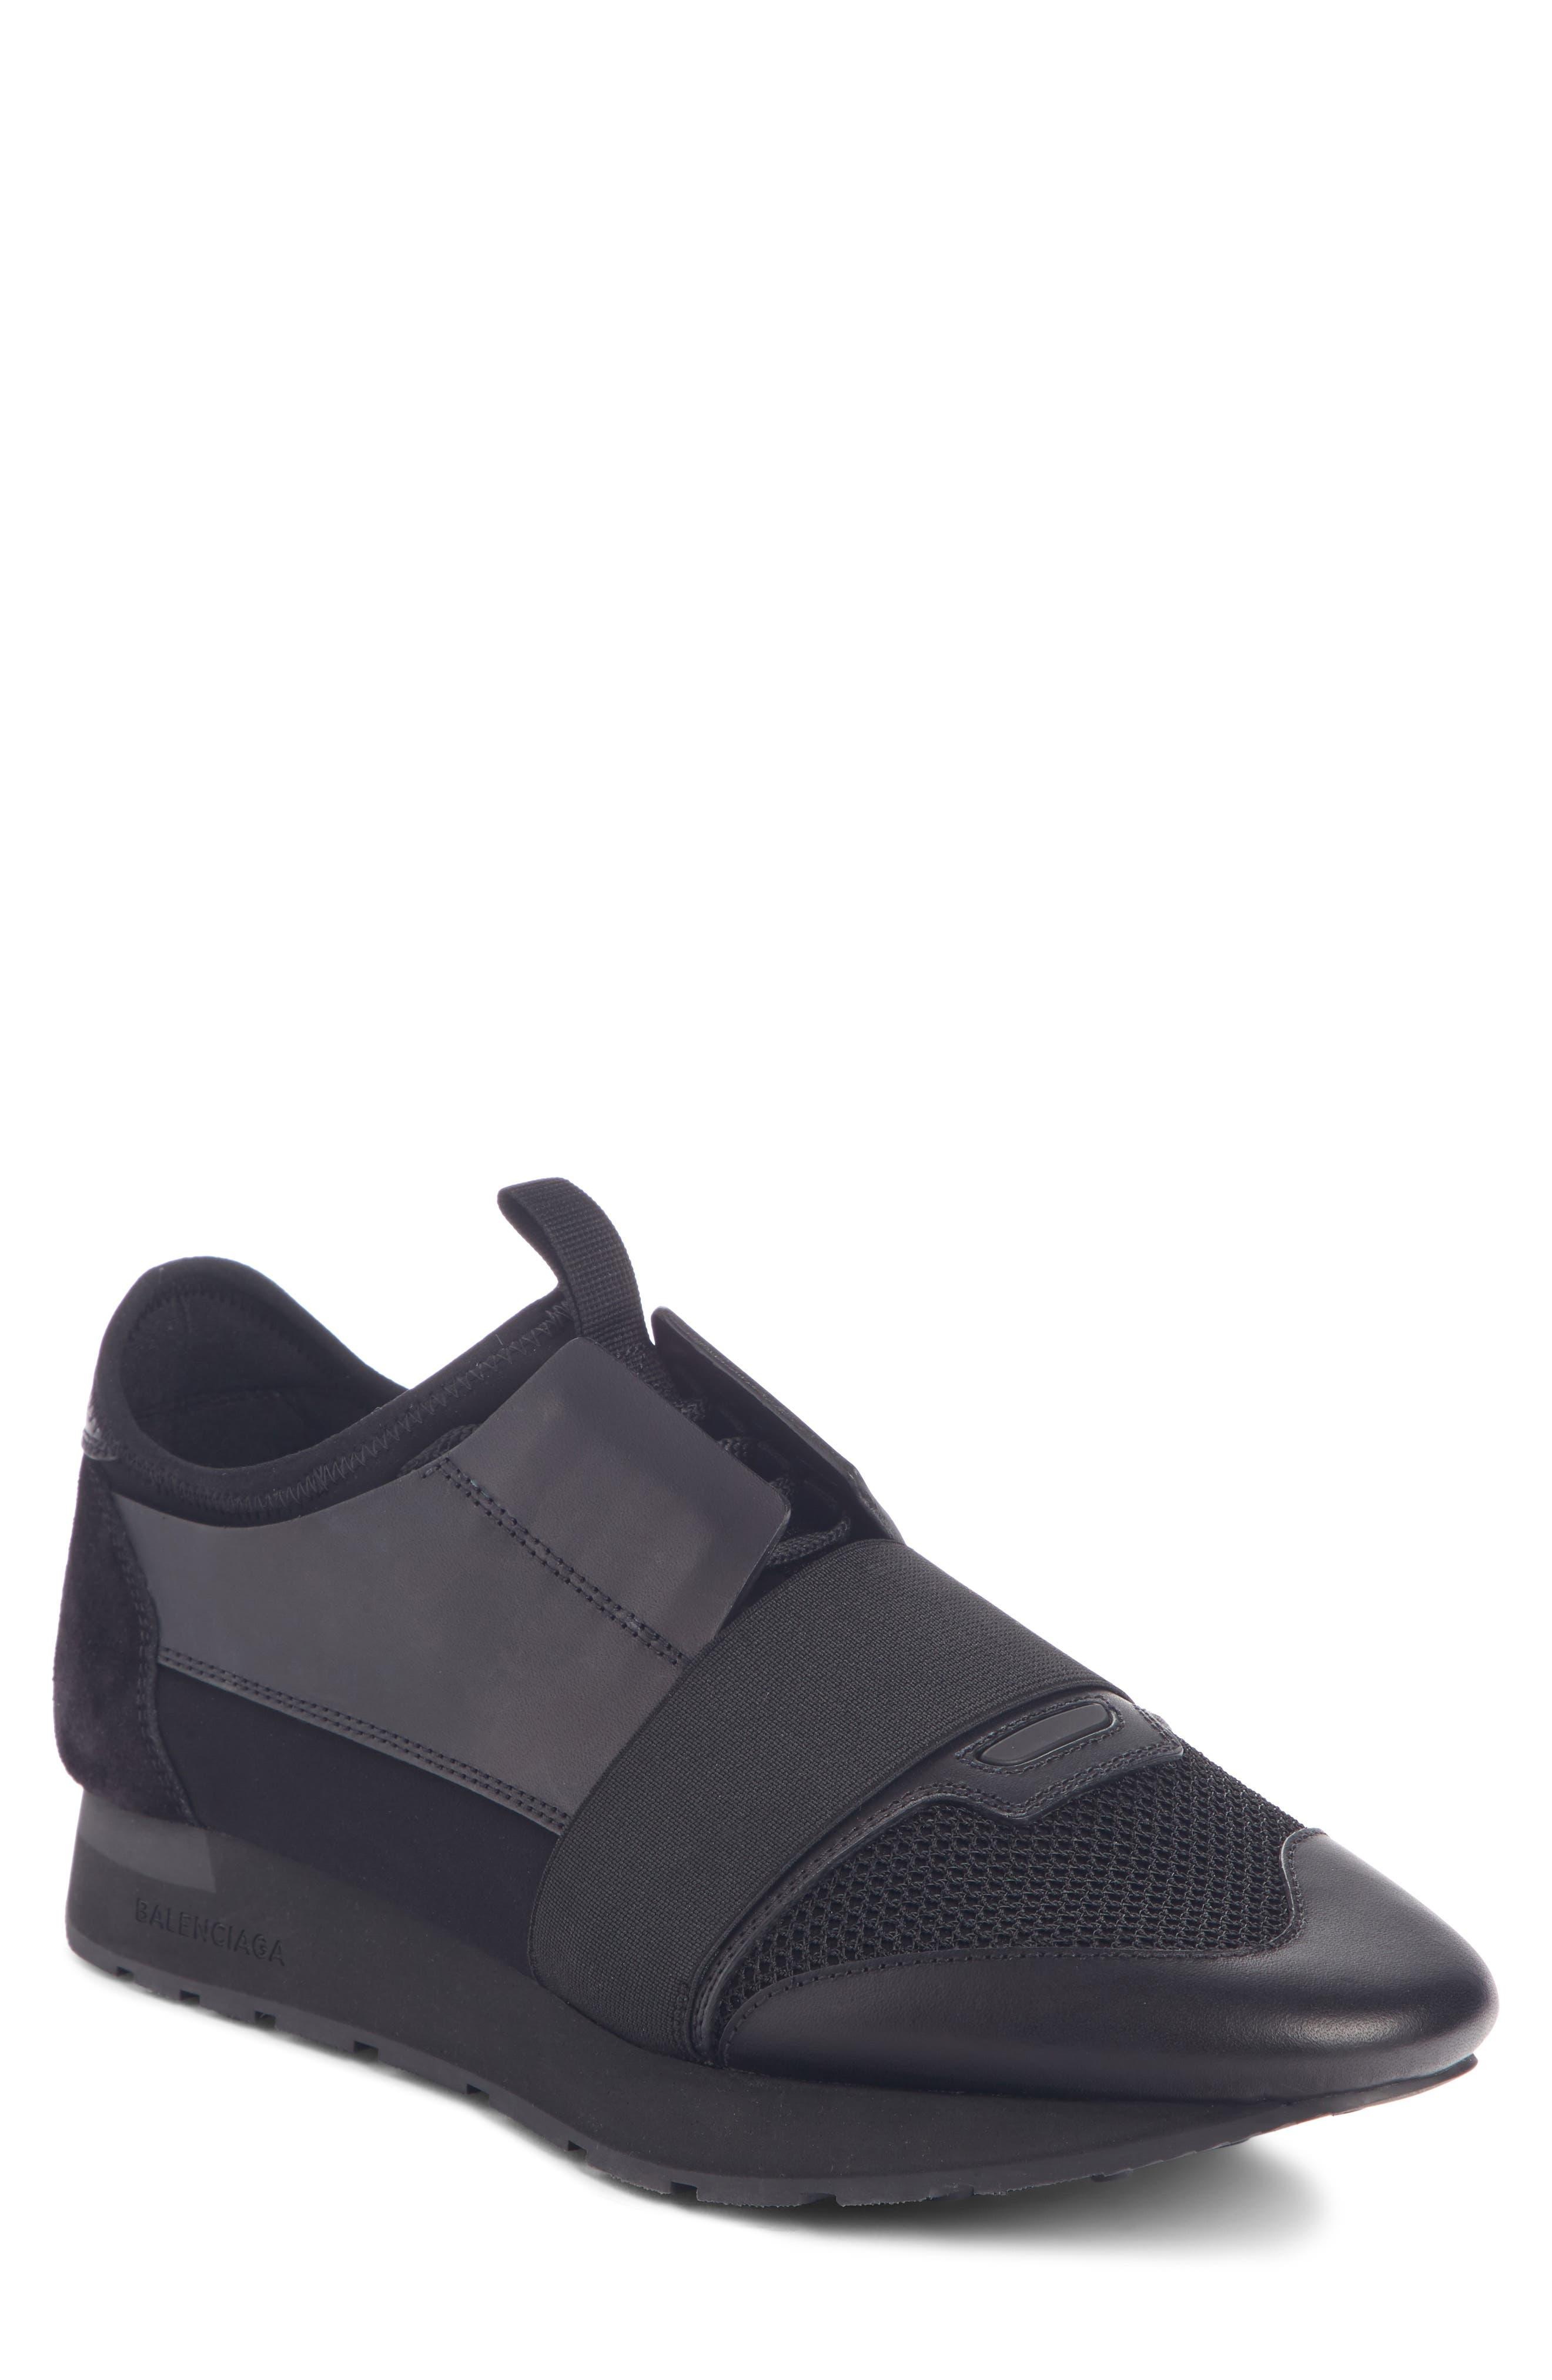 BALENCIAGA Race Runner Sneaker, Main, color, BLACK/ BLACK/ BLACK